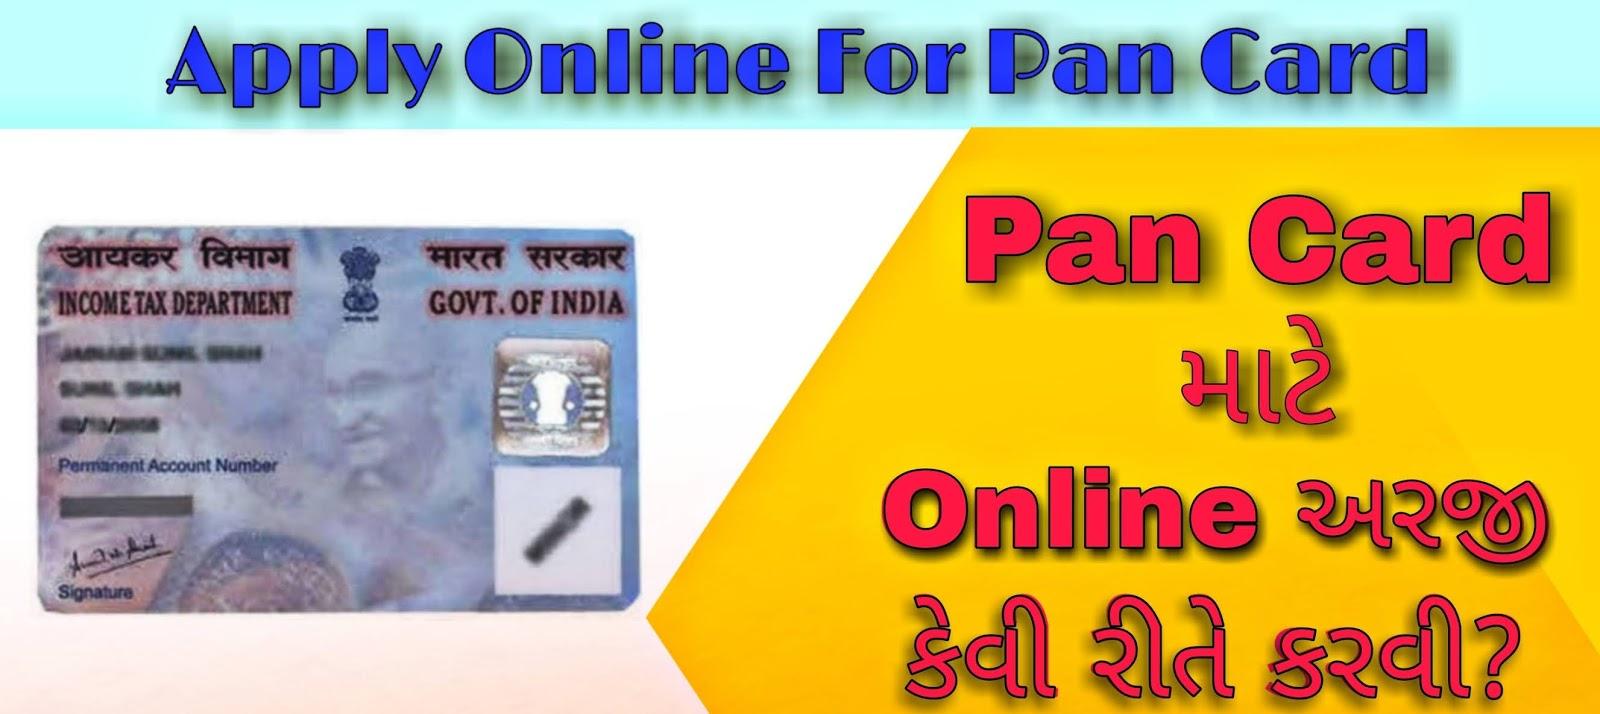 Apply online for pan card gujarati , Pan card માટે અરજી કેવી રીતે કરવી?,પાન કાર્ડ